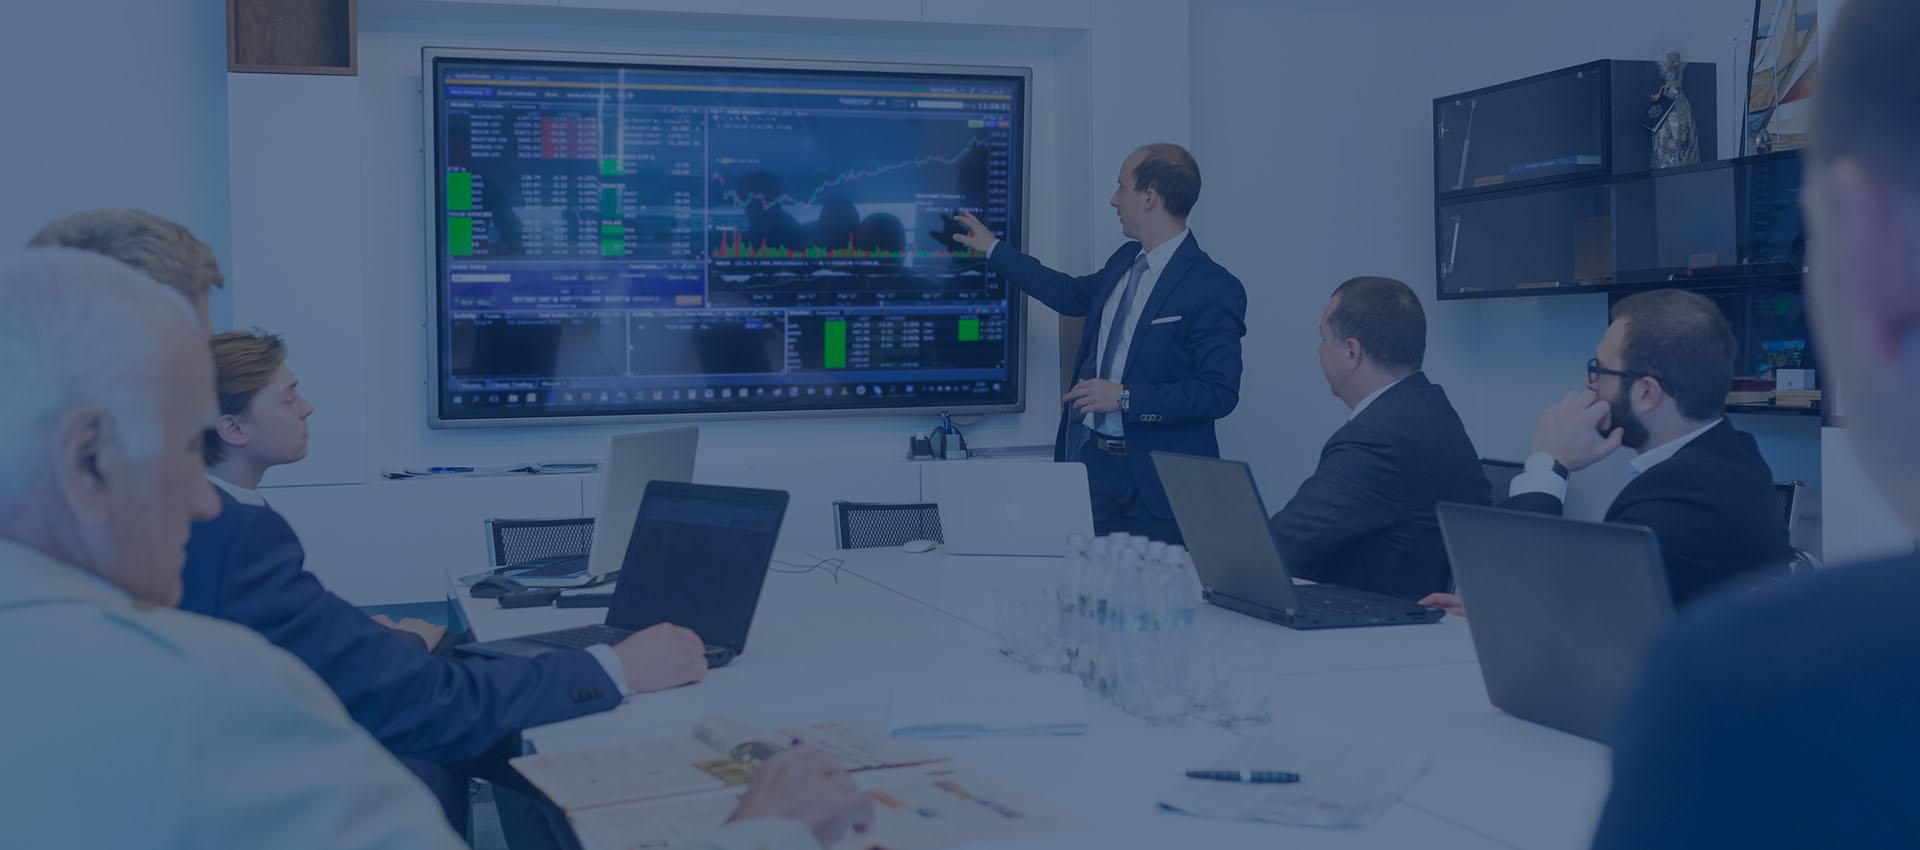 exantas greece - corporate meetings